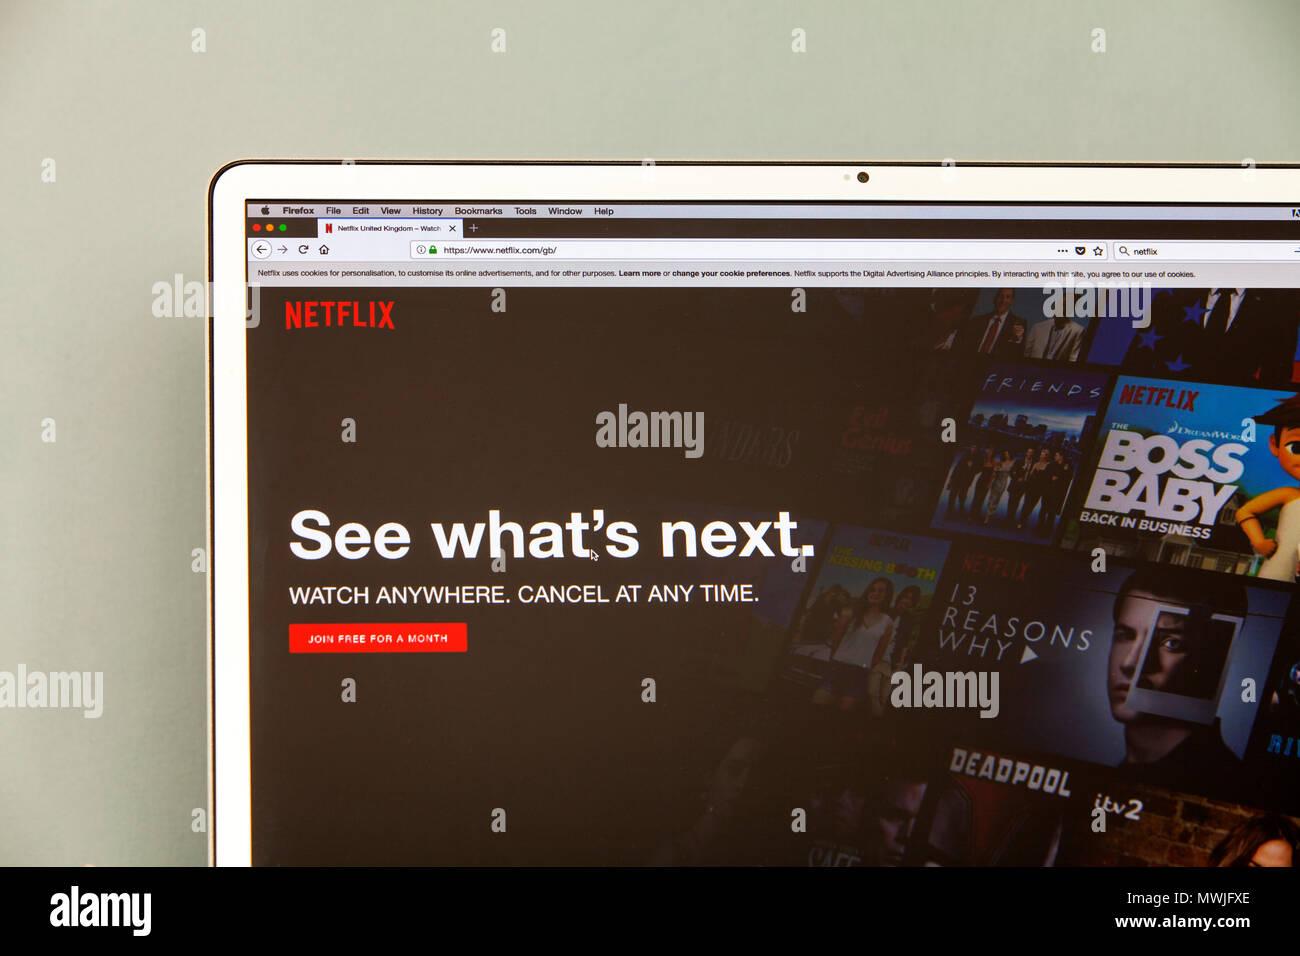 Netflix Homepage, Netflix.com, Netflix streaming service, Netflix films, Netflix screen, Netflix logo, Netflix movies & shows online, Netflix online - Stock Image